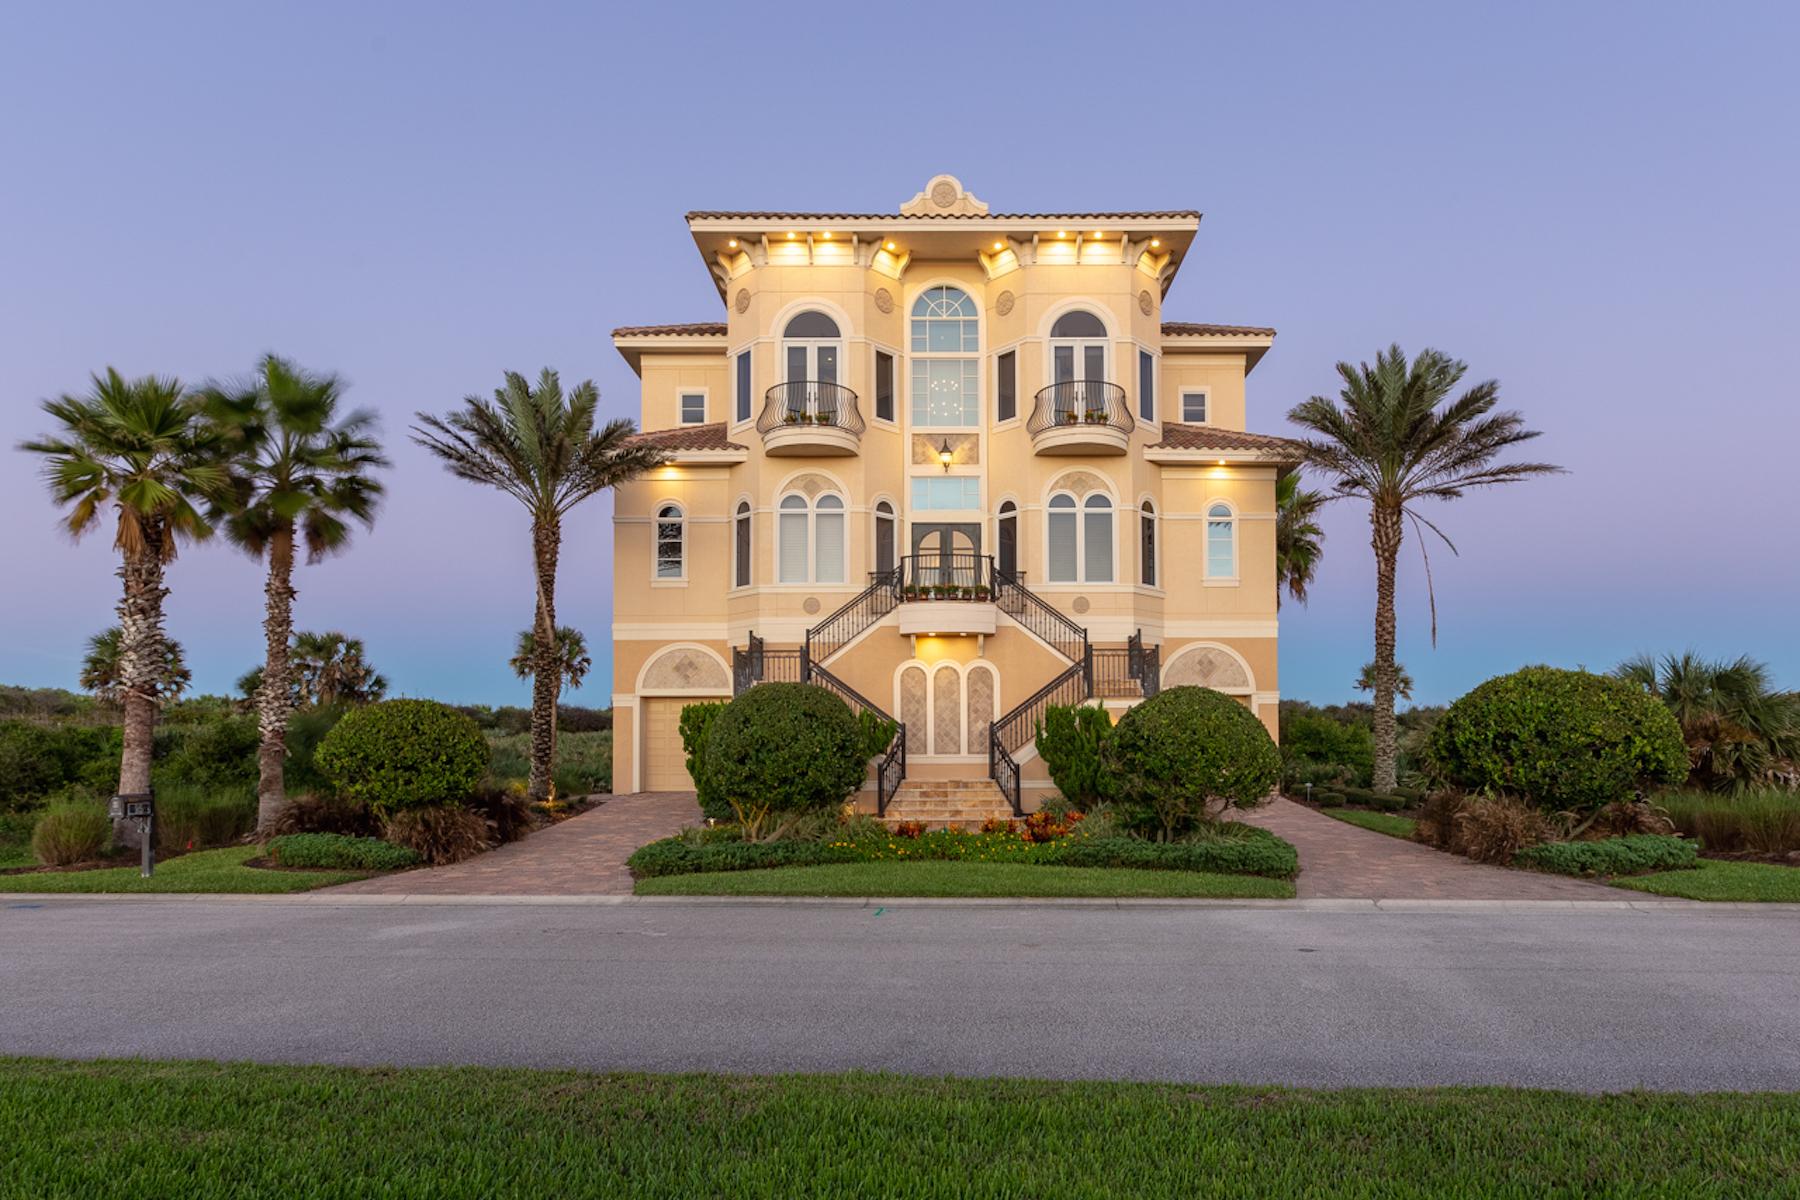 Single Family Homes için Satış at Grand Living on the Ocean 95 Calle Del Sur, Palm Coast, Florida 32137 Amerika Birleşik Devletleri